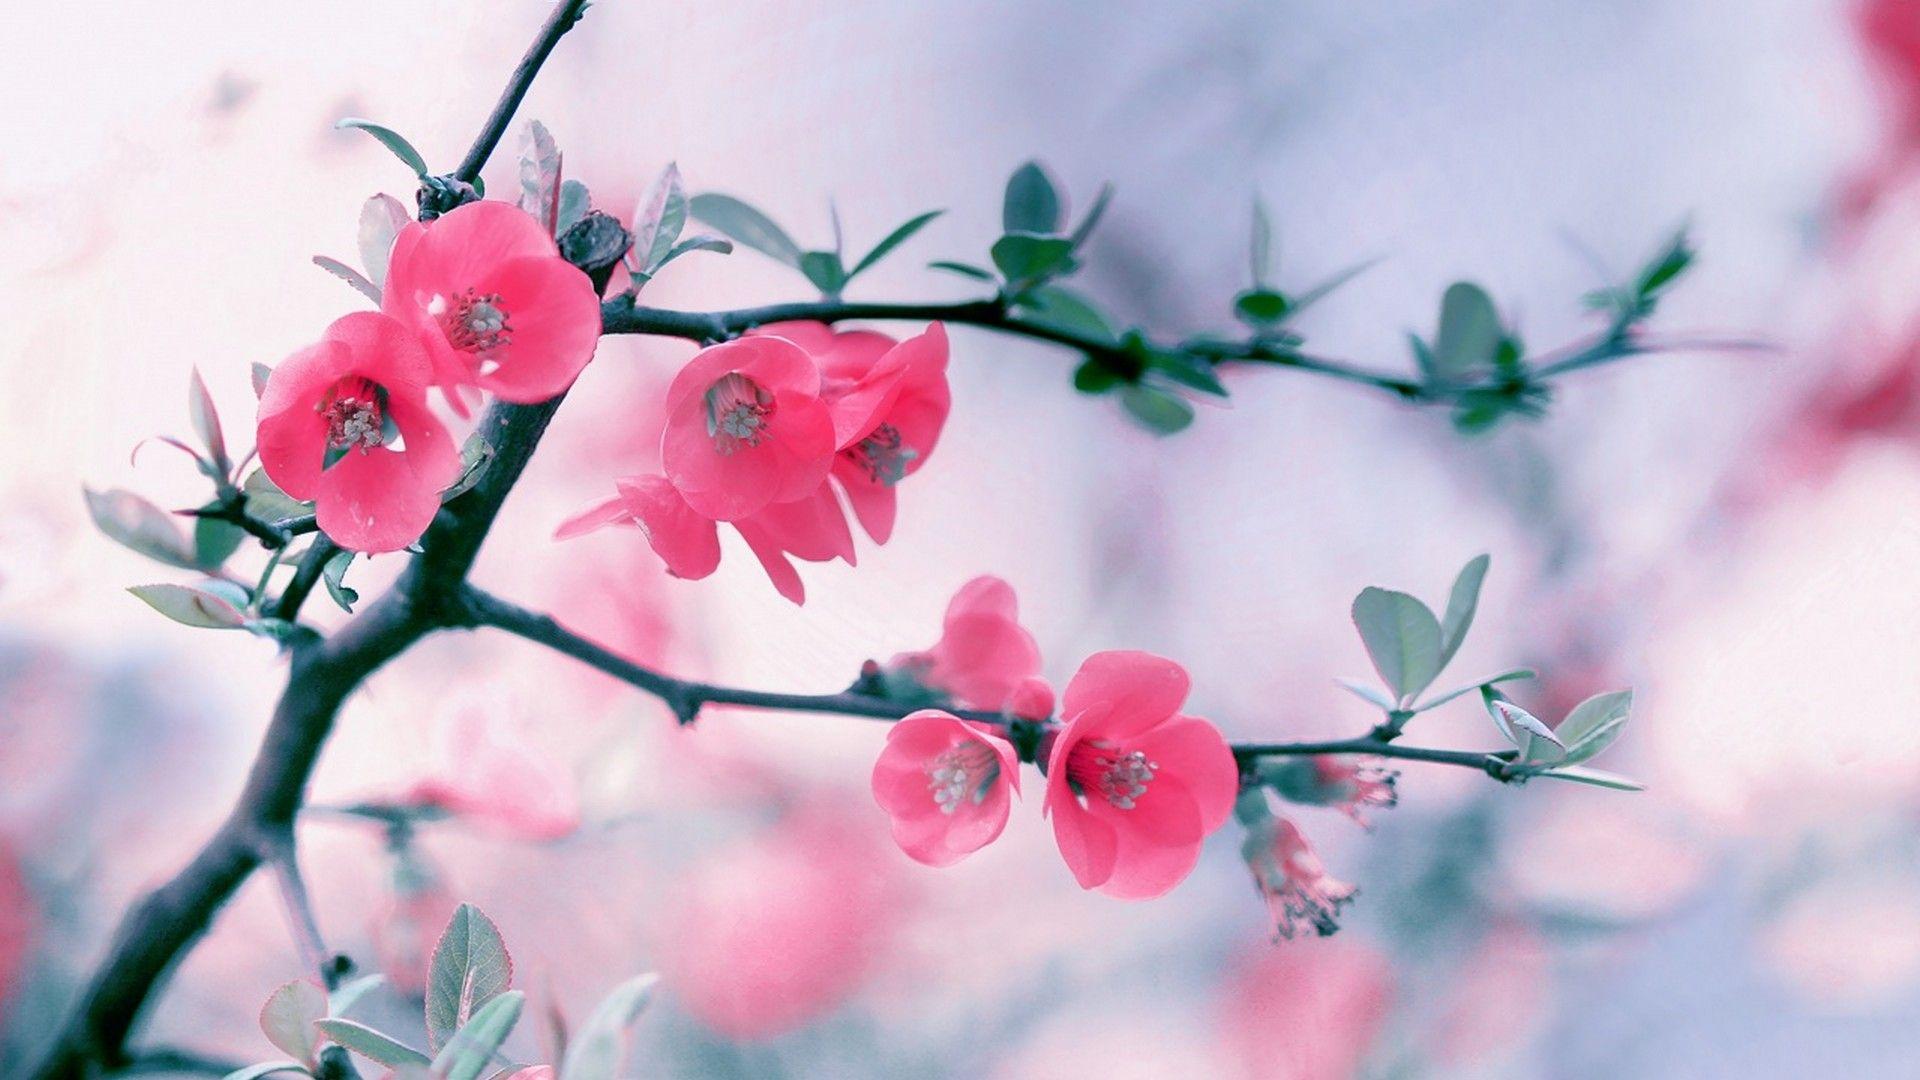 Cute Spring Wallpaper Hd 2021 Live Wallpaper Hd Spring Wallpaper Flower Wallpaper Flower Backgrounds